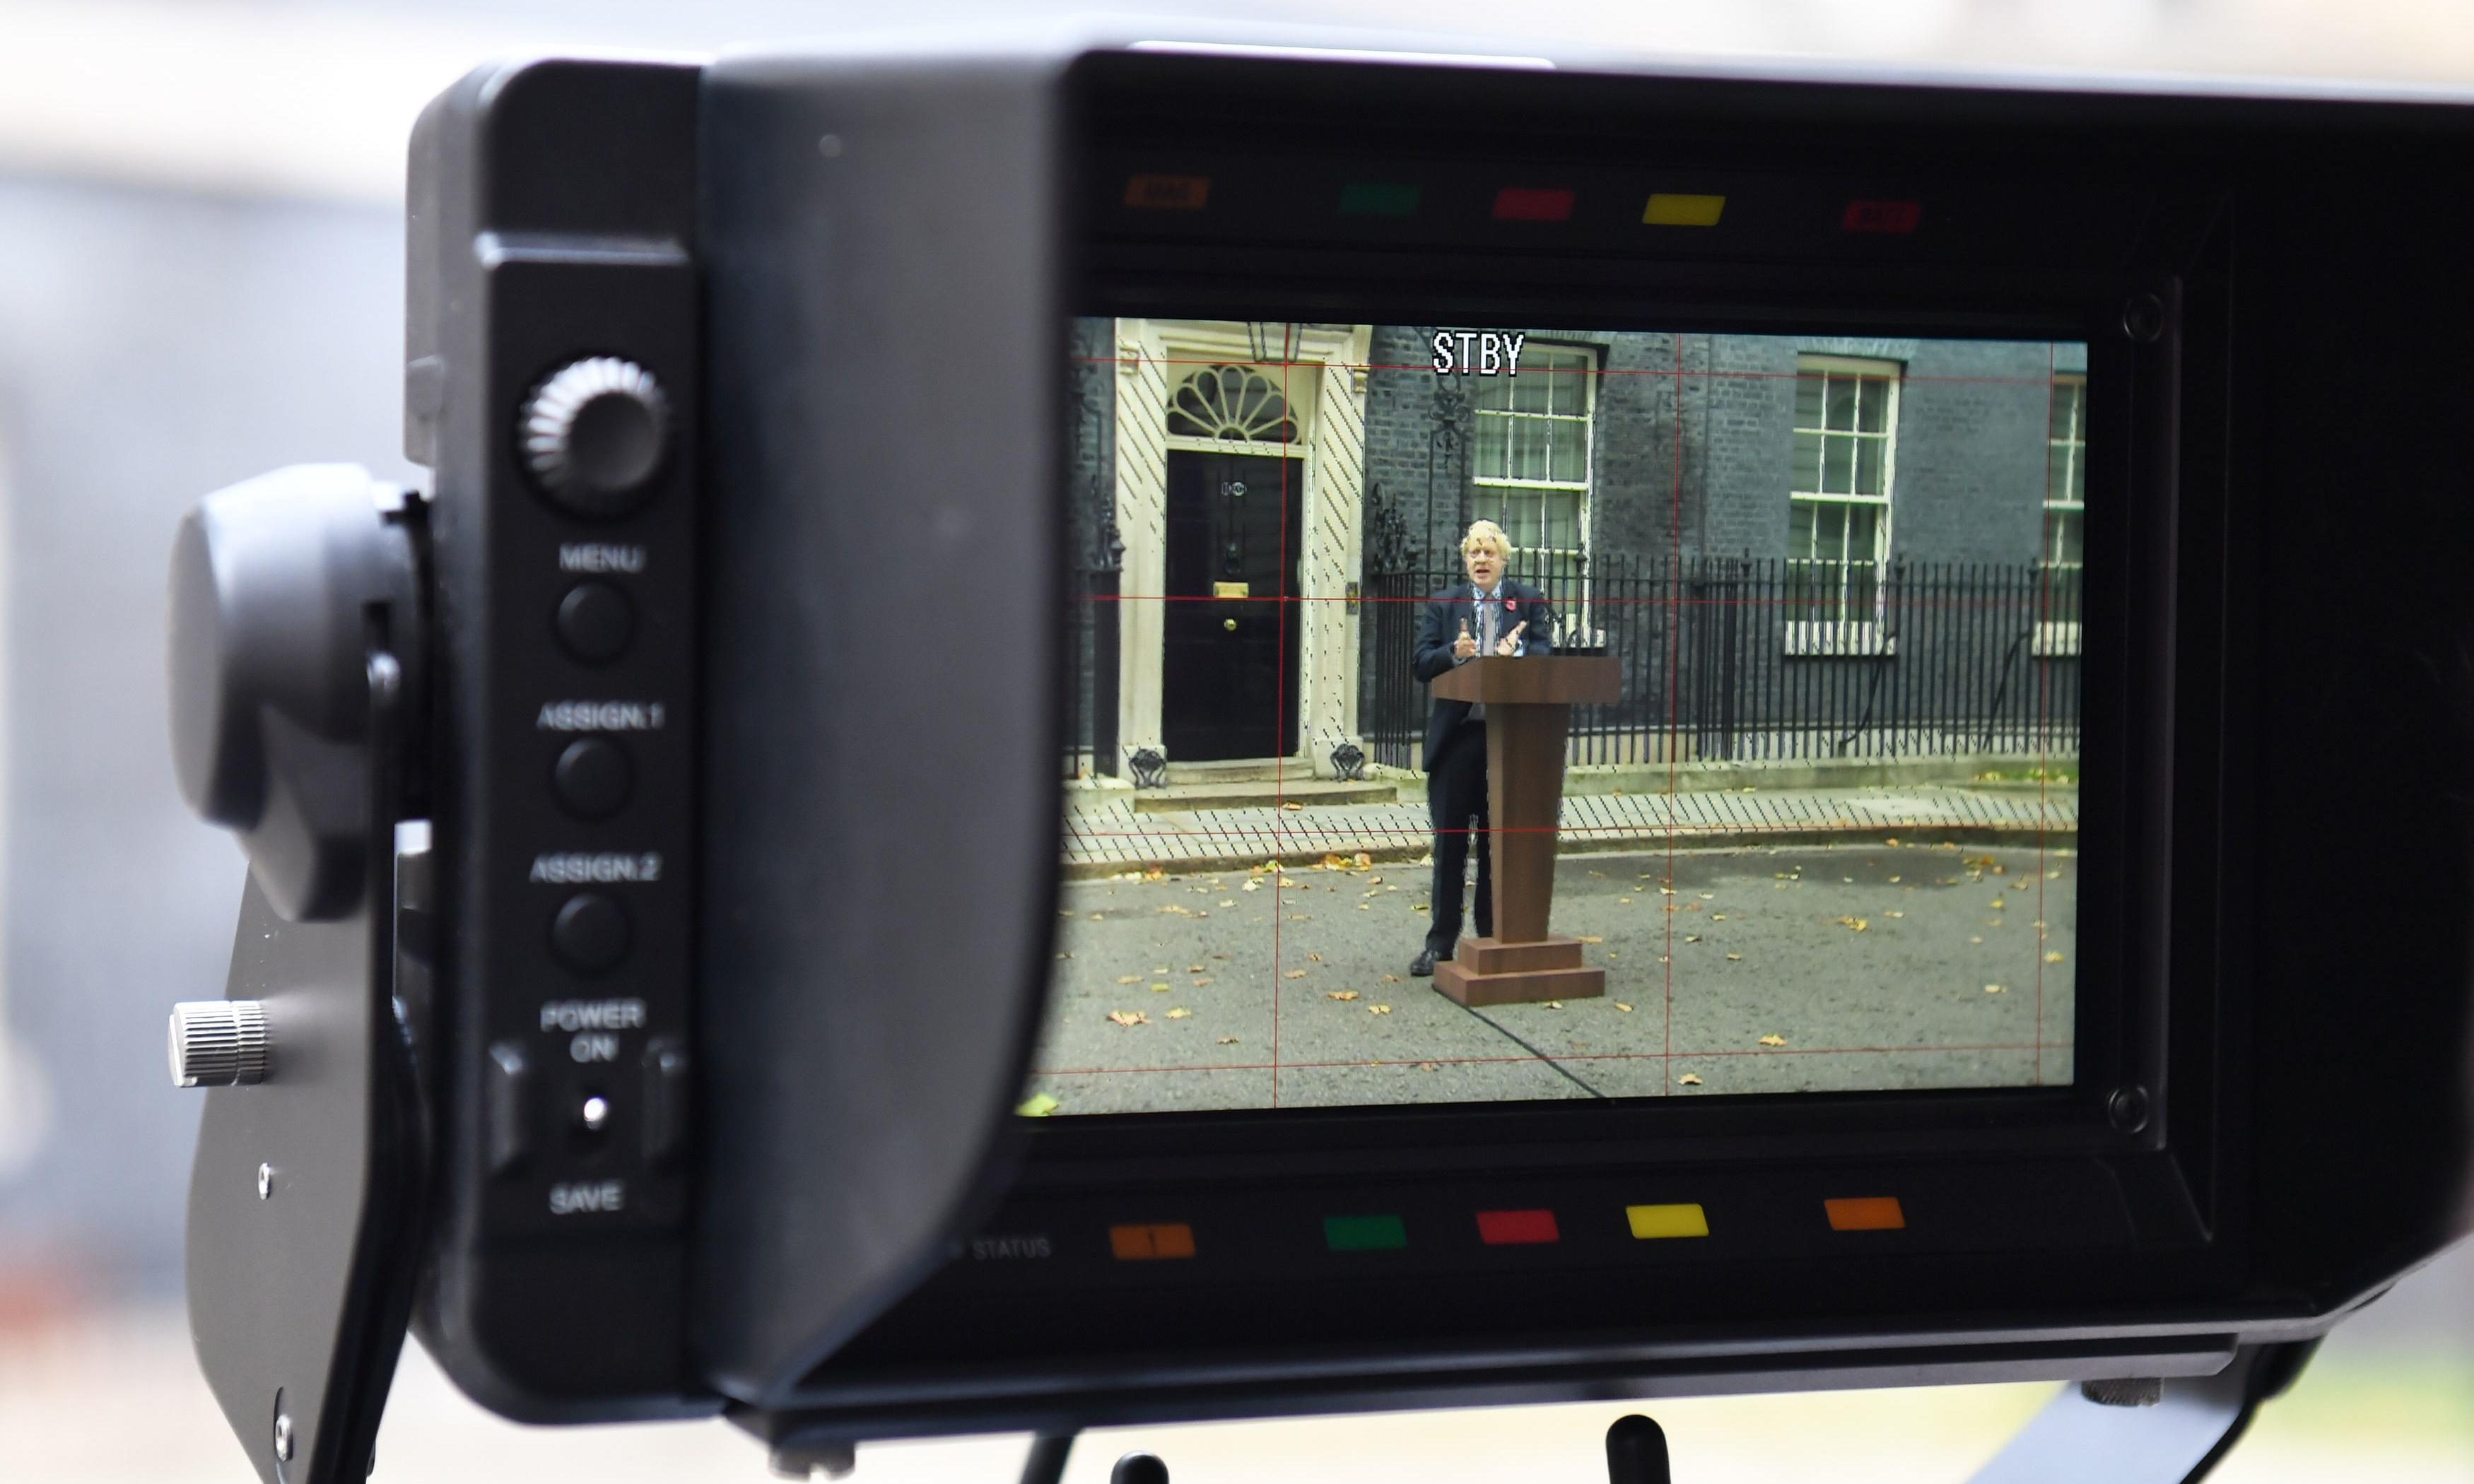 'I find it so depressing': readers on UK election news